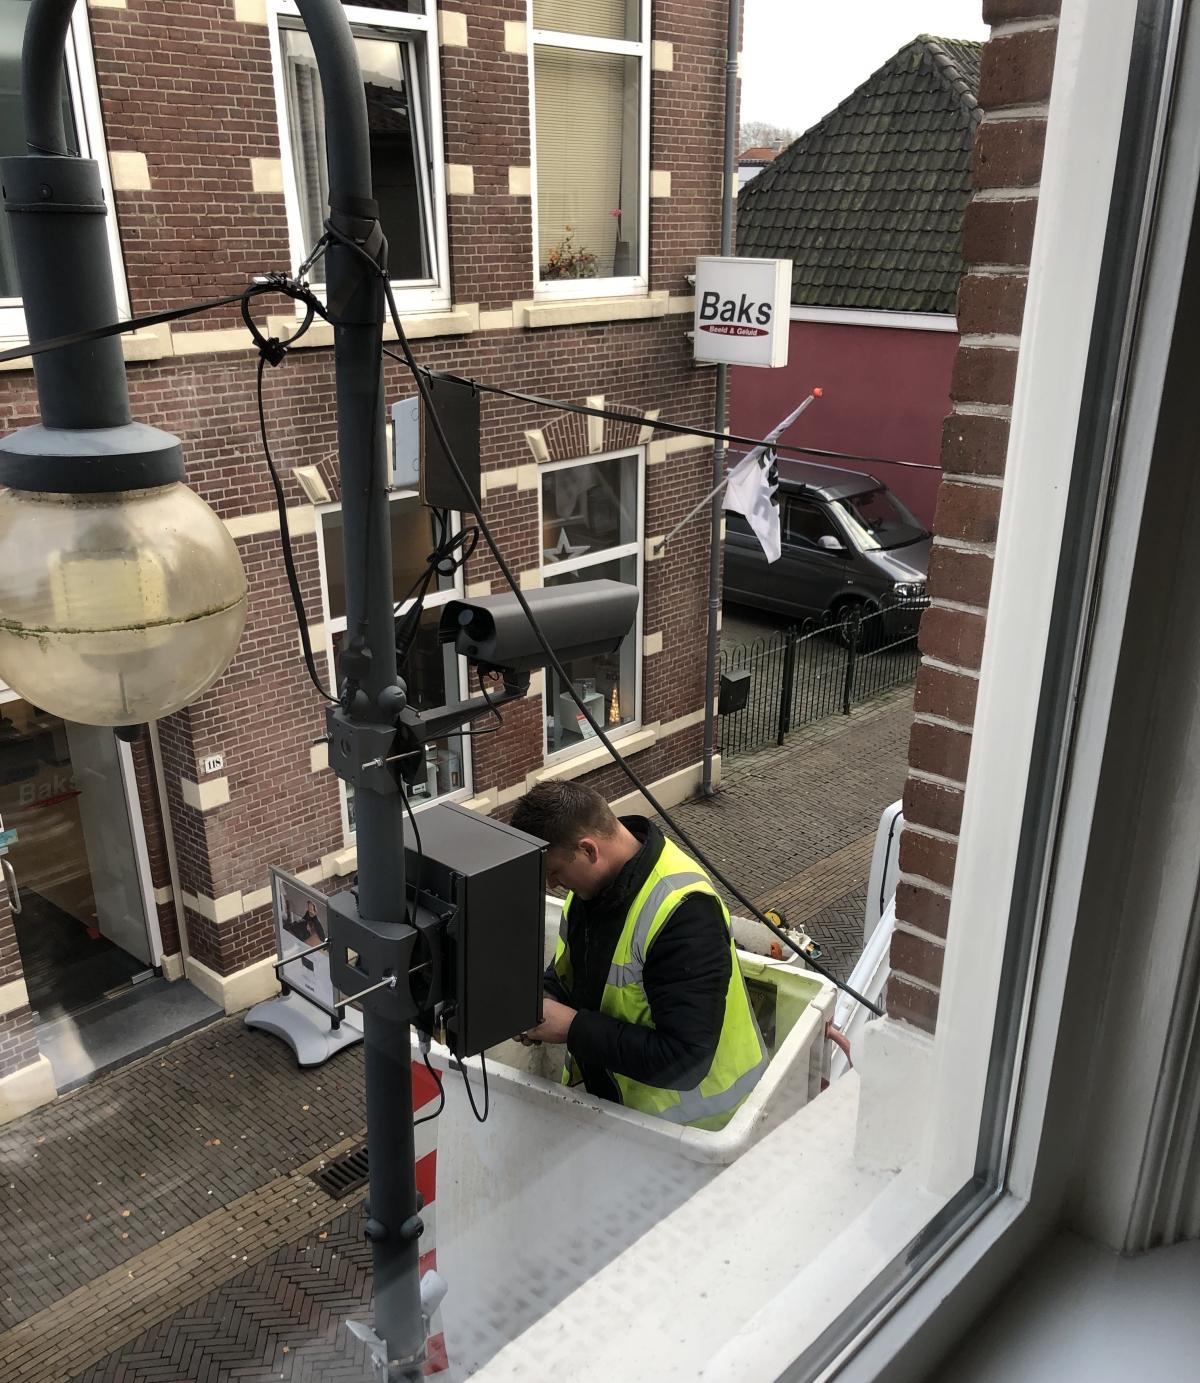 Extra cameras voor toegangscontrole centrumgebied